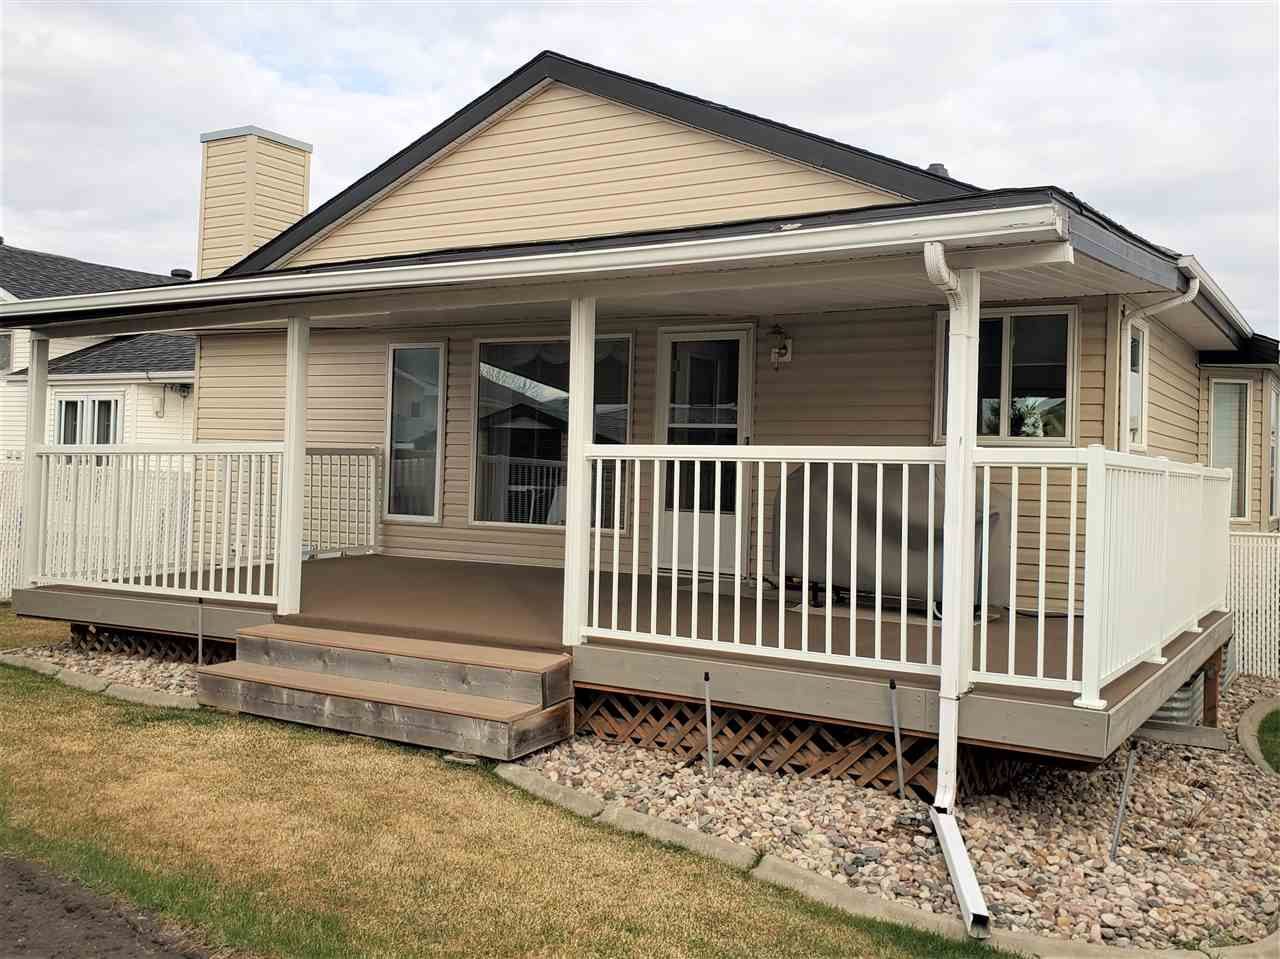 Main Photo: 94 OZERNA Road in Edmonton: Zone 28 House for sale : MLS®# E4148623